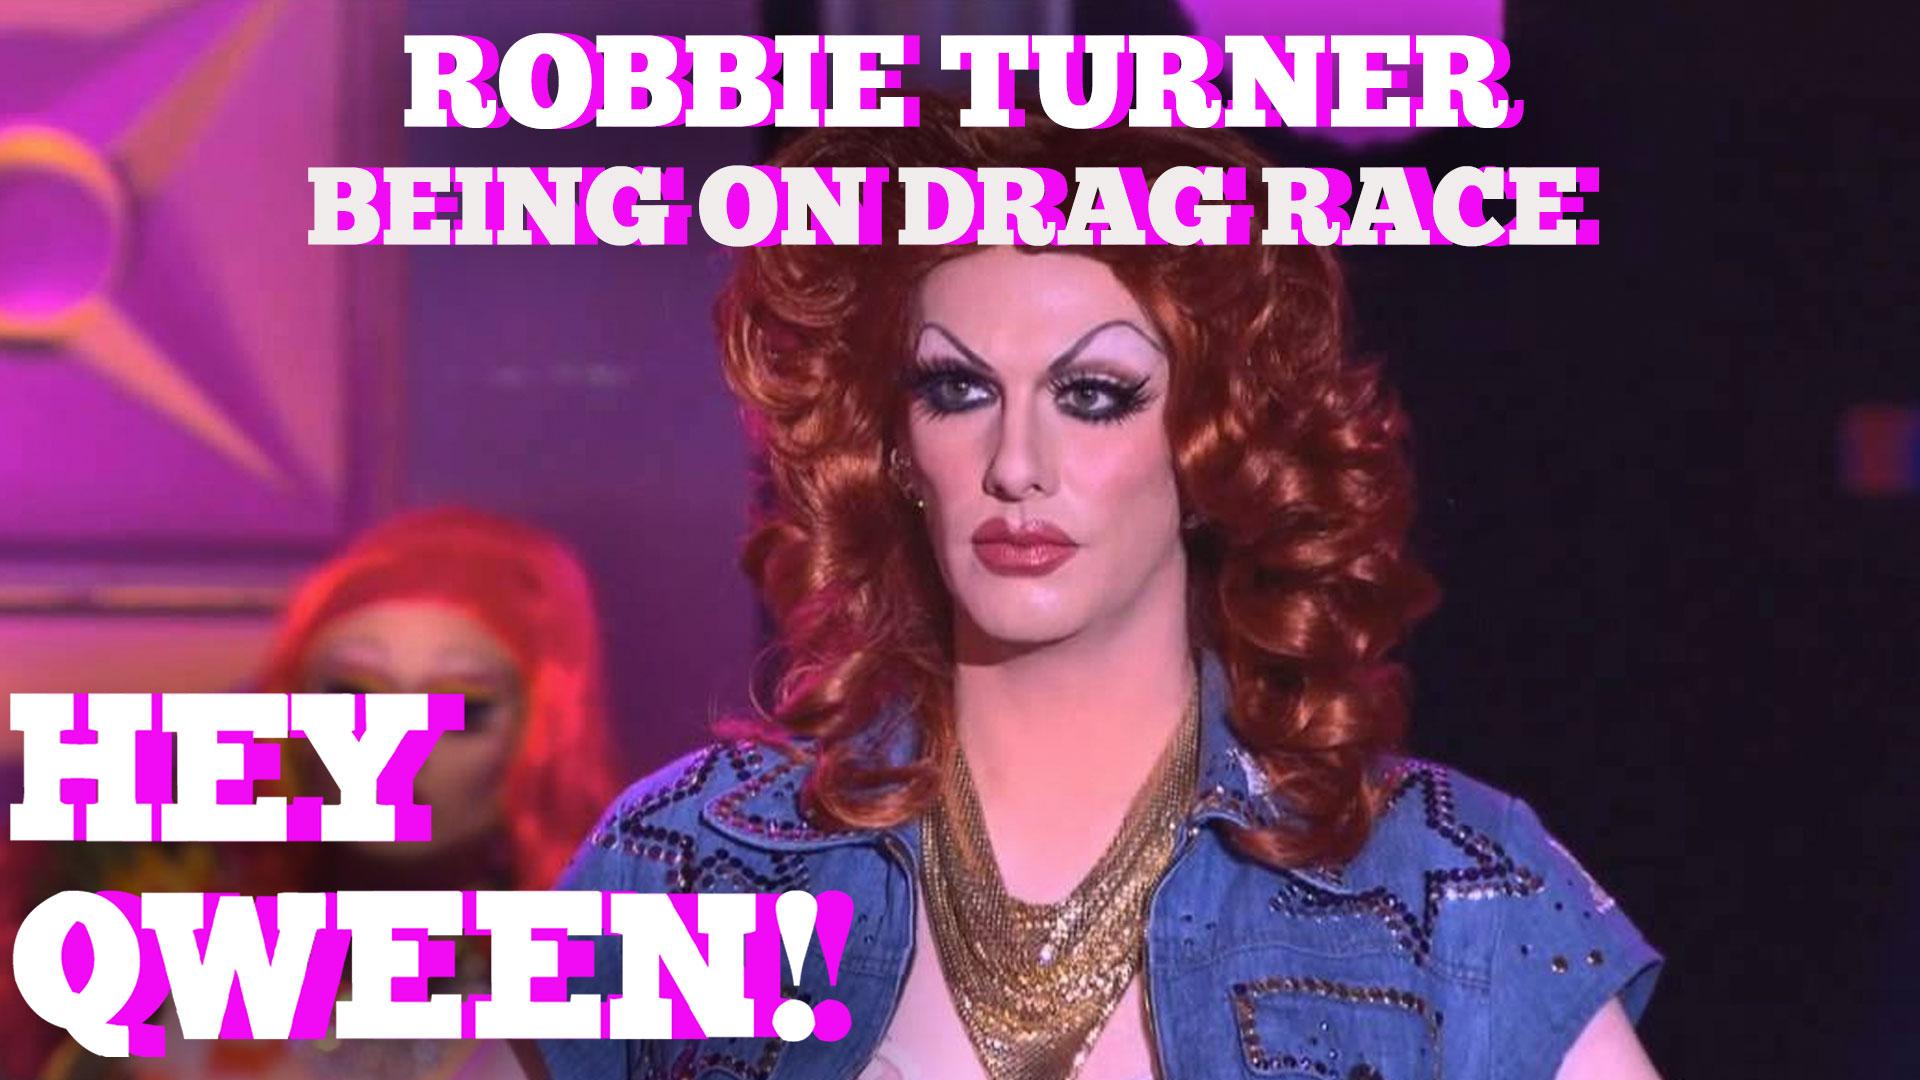 Robbie Turner : Being On RuPaul's Drag Race : Hey Qween! HIGHLIGHT